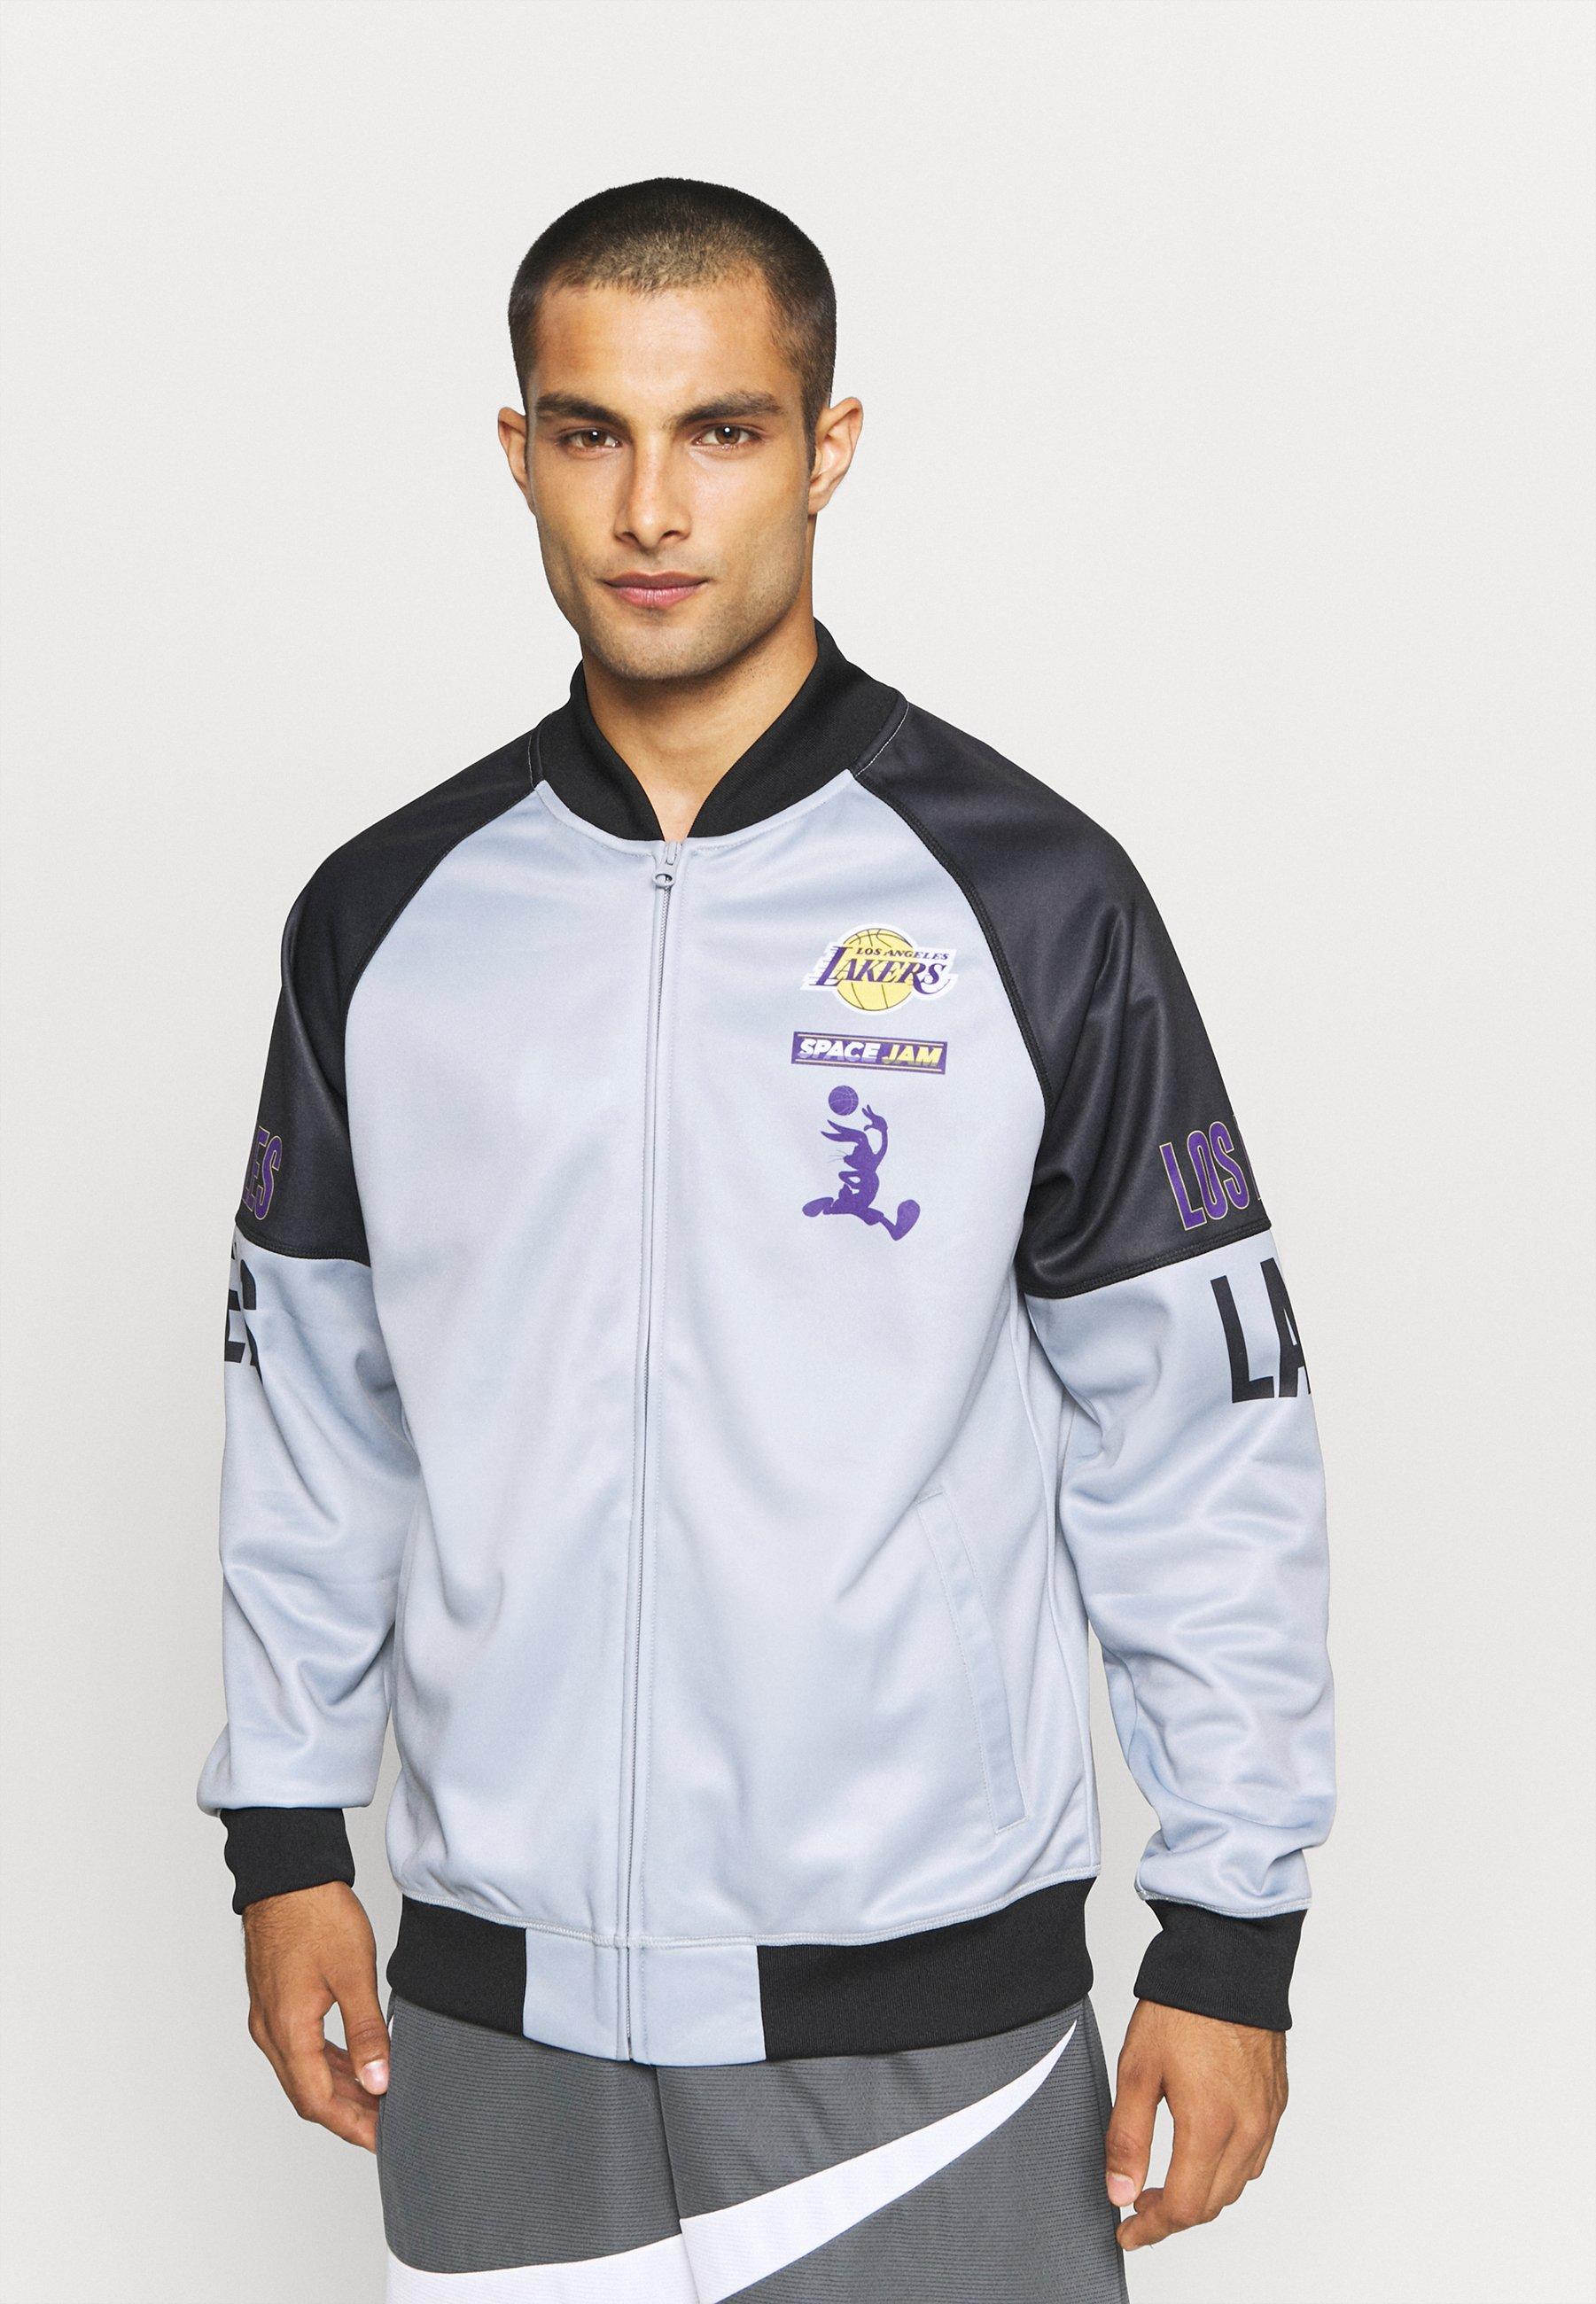 Men NBA LOS ANGELES LAKERS SPACE JAM 2 TEAM GAME CHANGER - Club wear